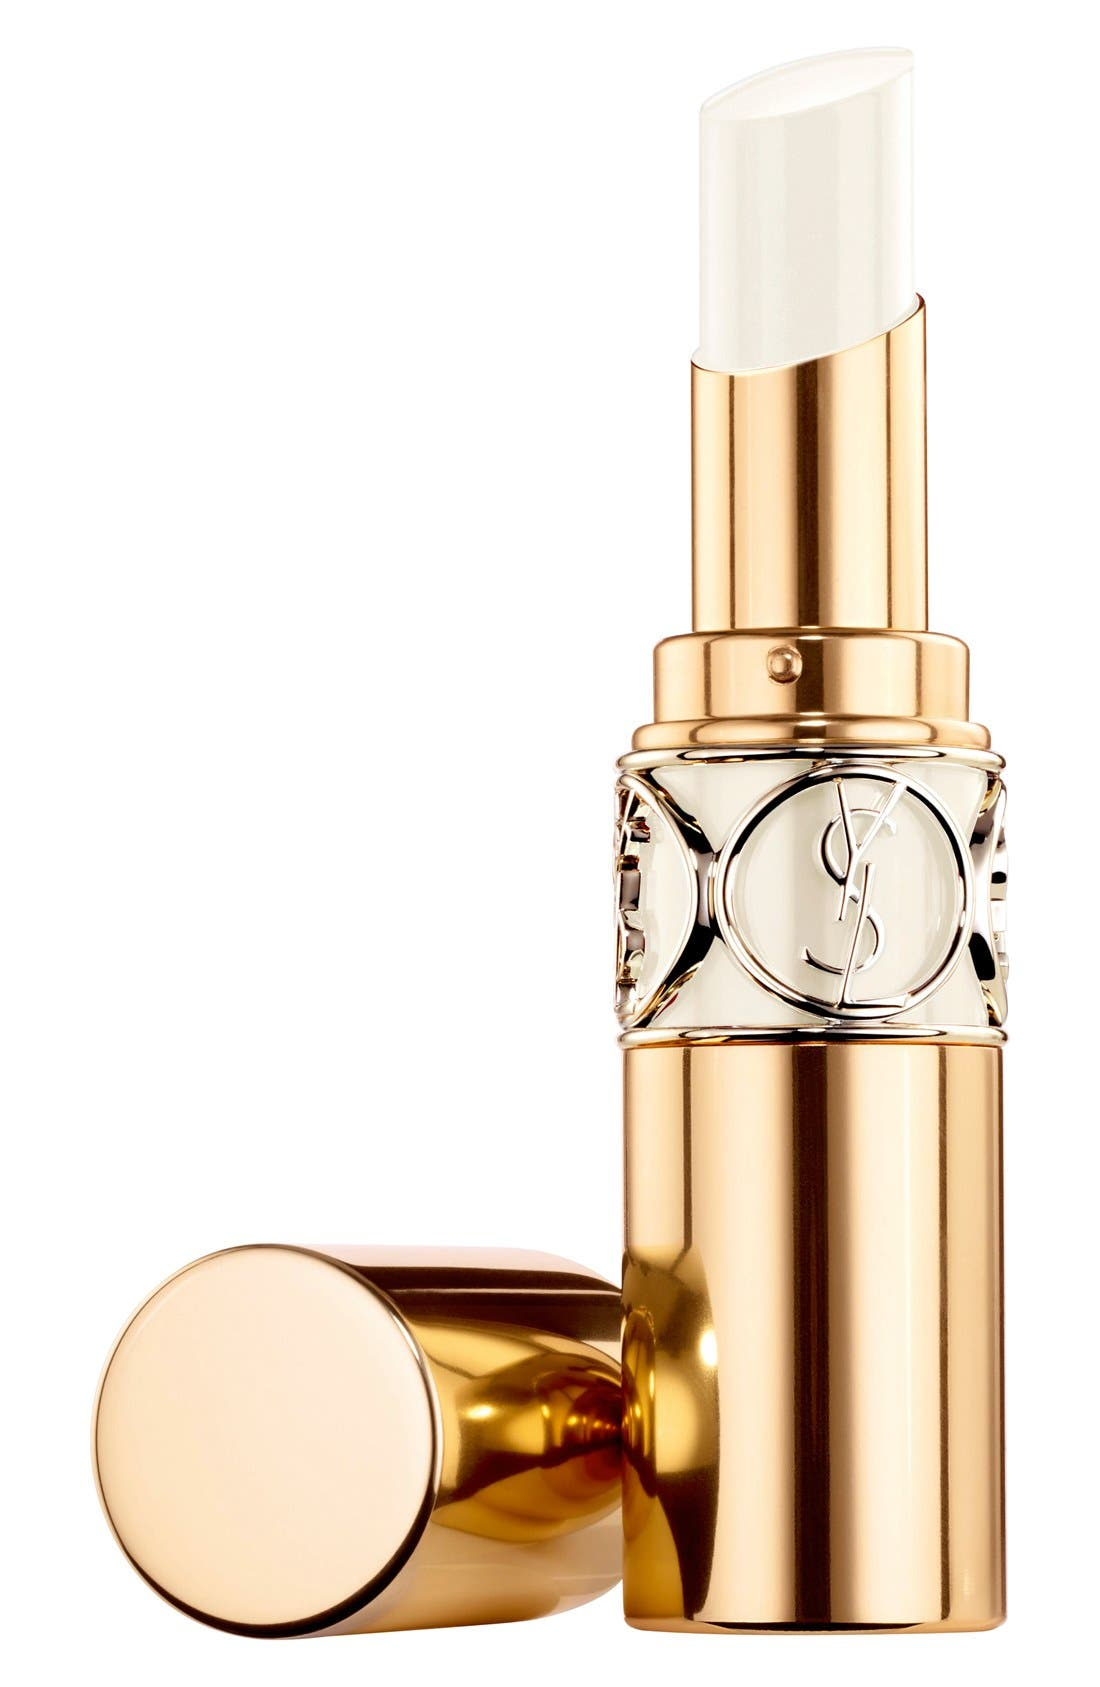 Yves Saint Laurent 'Rouge Volupté Shine' Oil-in-Stick Lipstick